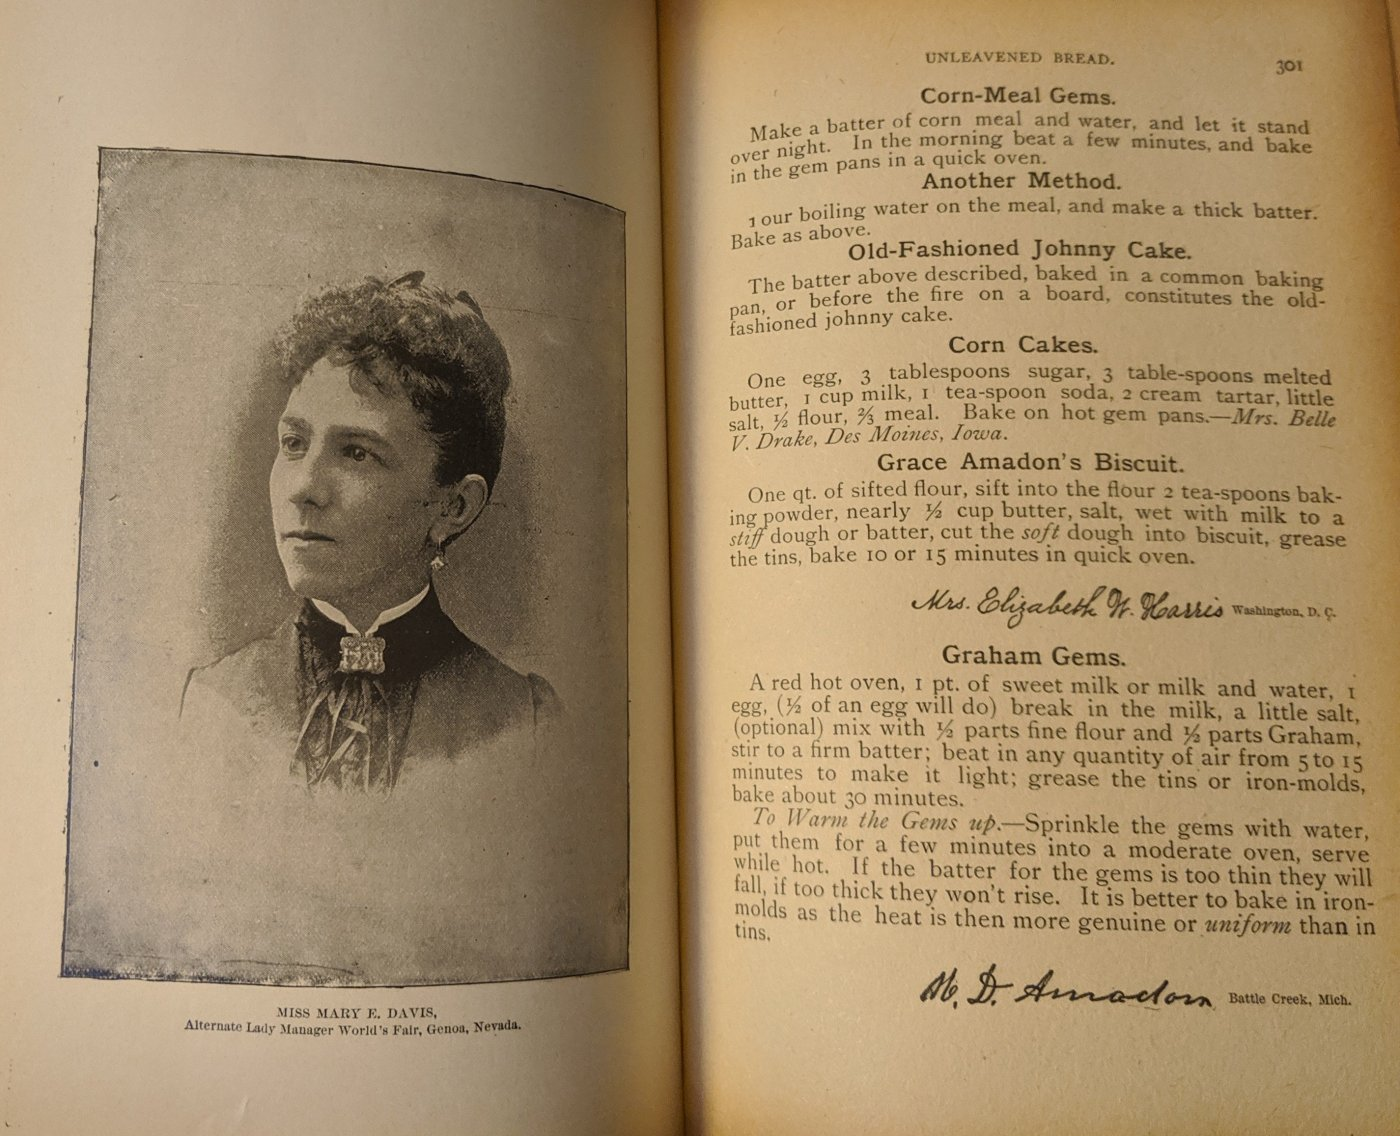 Corn-meal-gems-full-page-1893.jpg